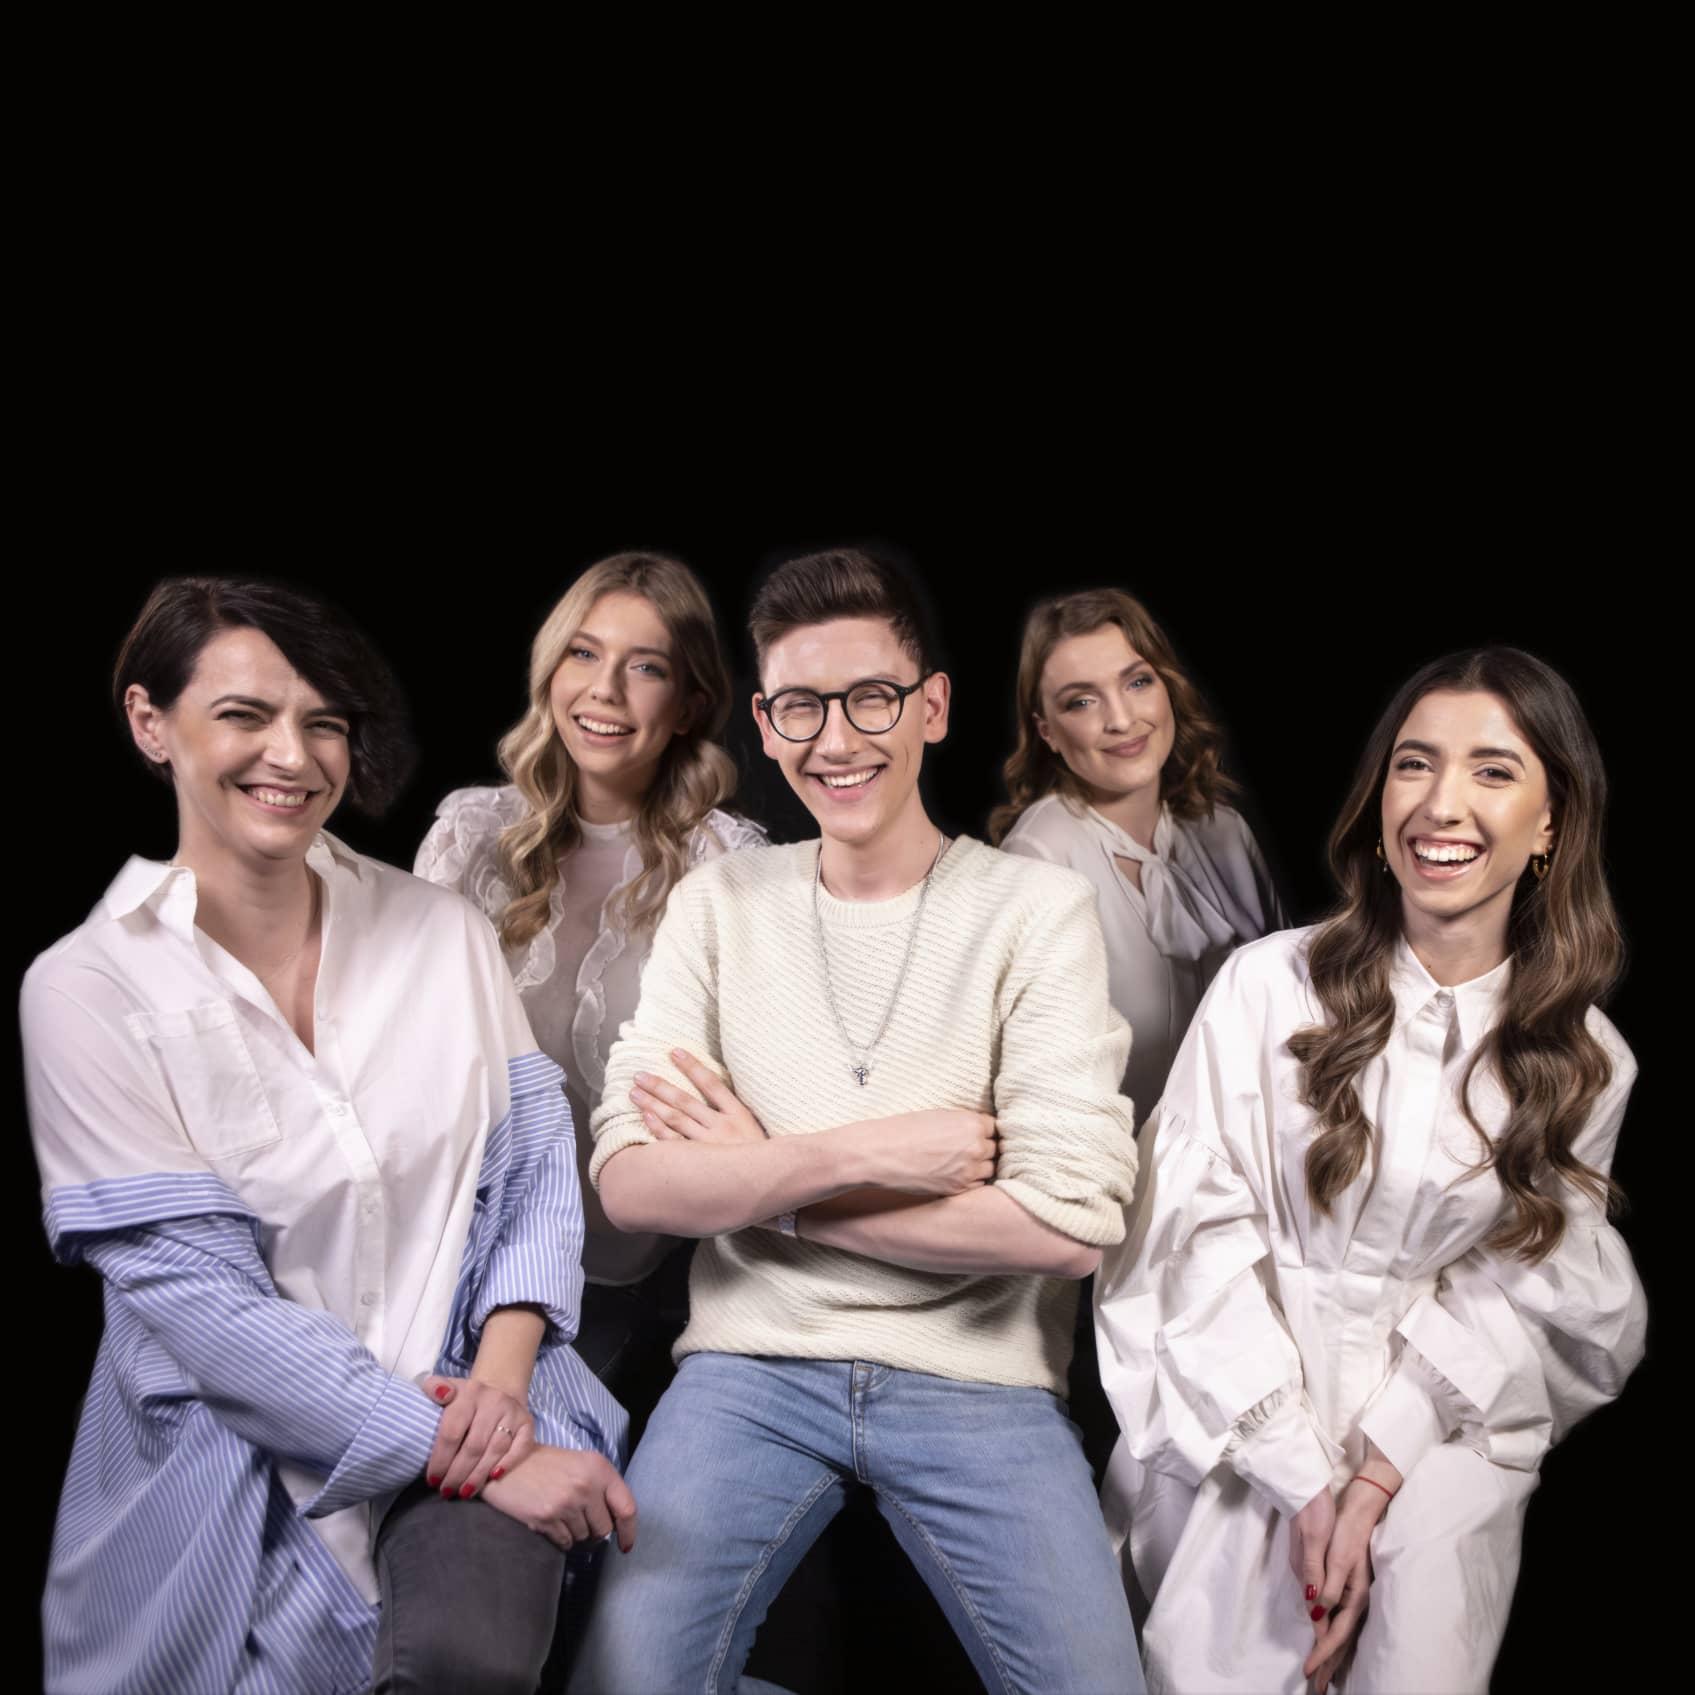 the Galerija team